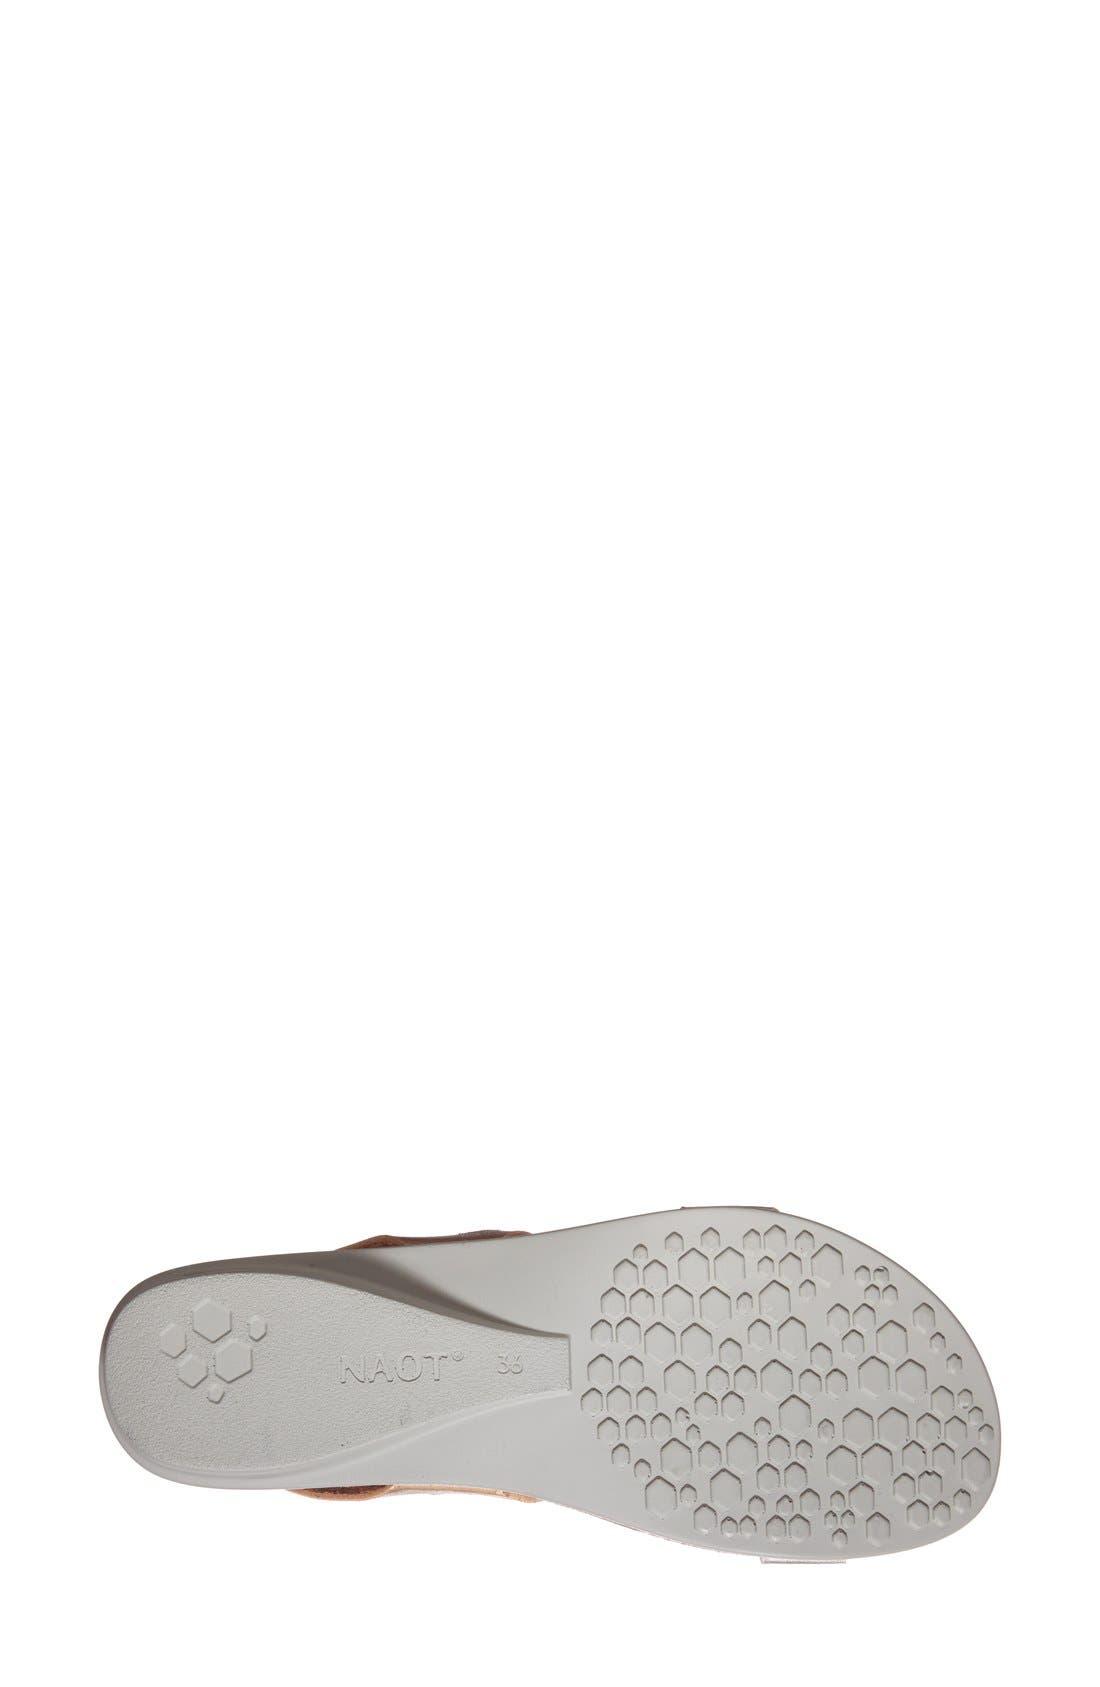 Alternate Image 4  - Naot 'Mint' Sandal (Women)